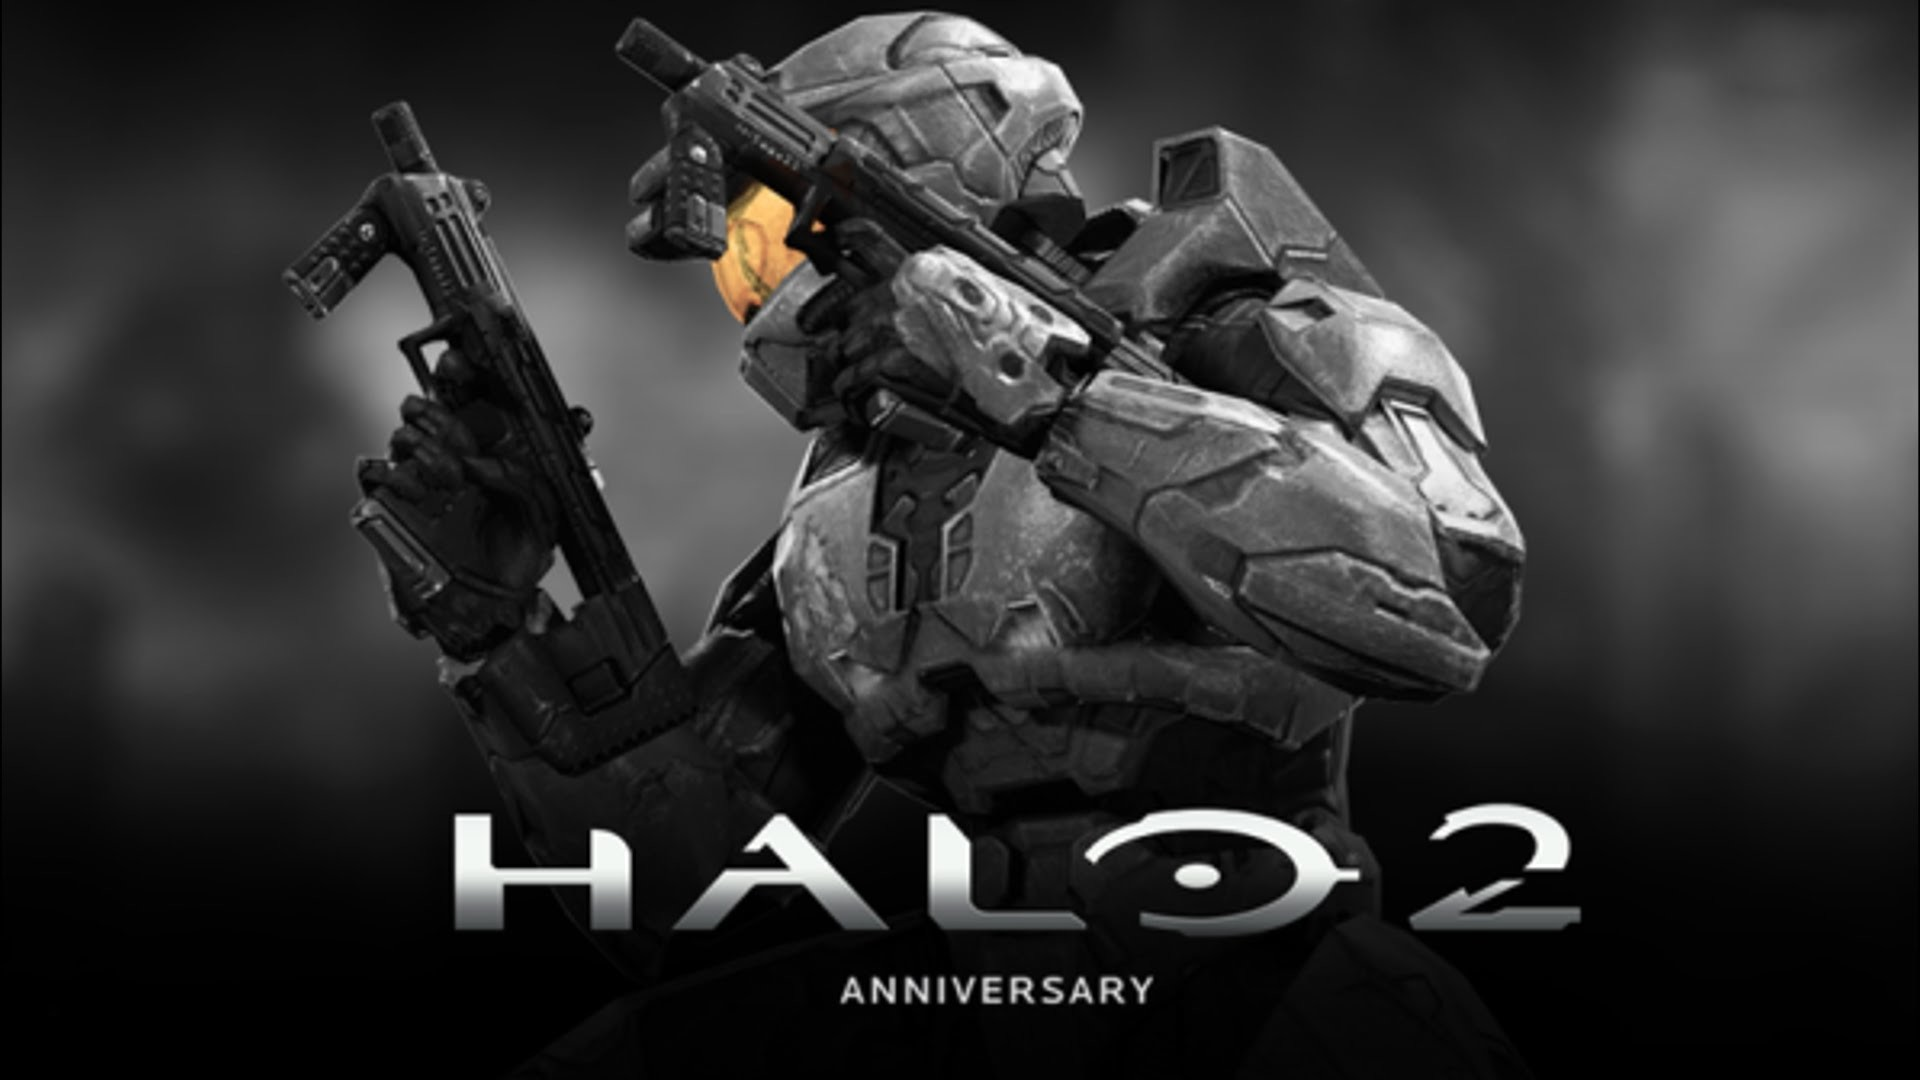 Halo 2 Anniversary The Movie – Halo 2 Remastered All Cut Scenes /  Cinematics – YouTube